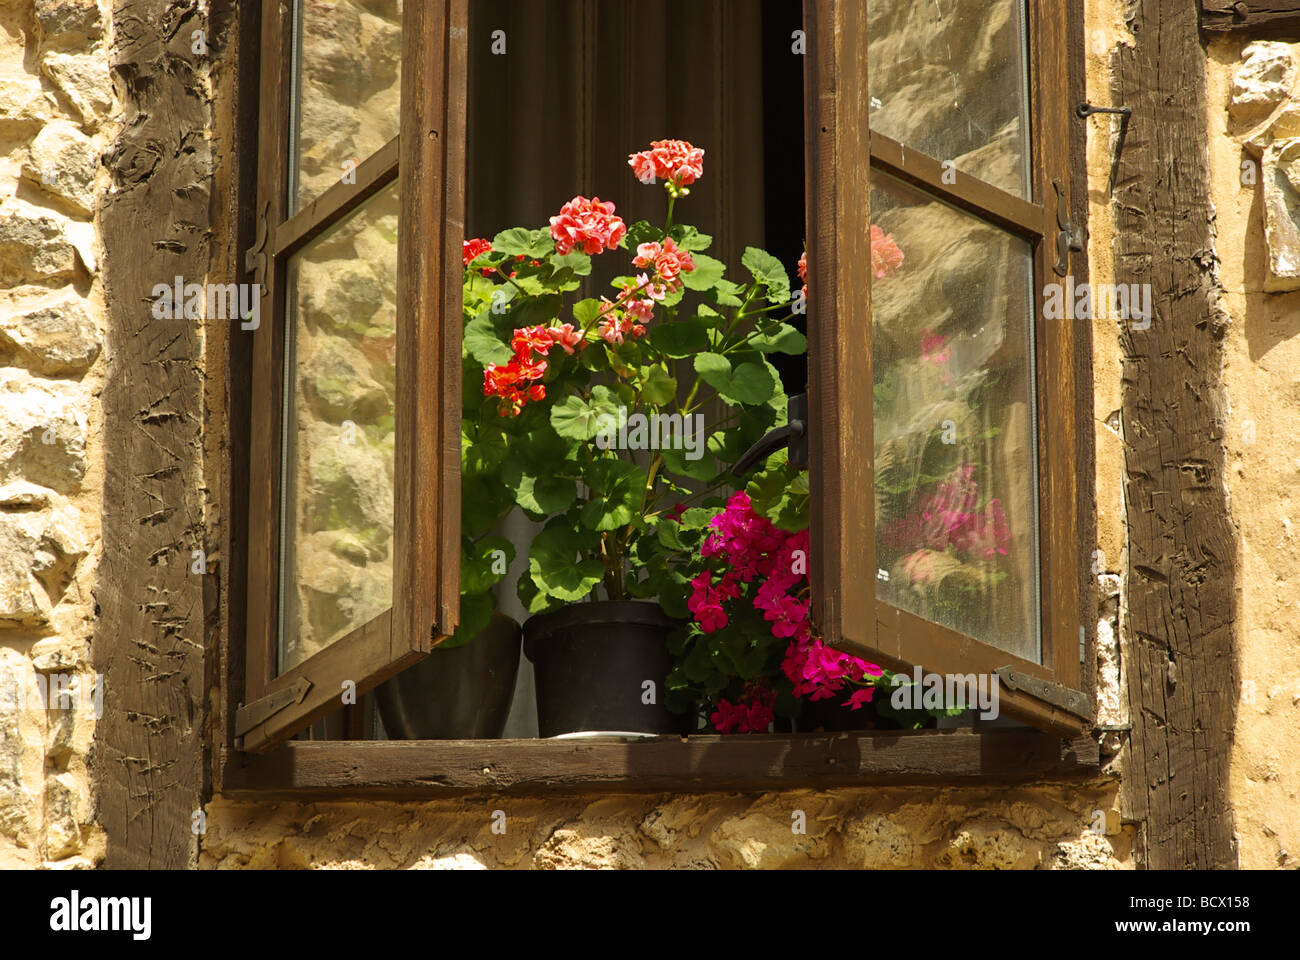 Fenster window 17 - Stock Image